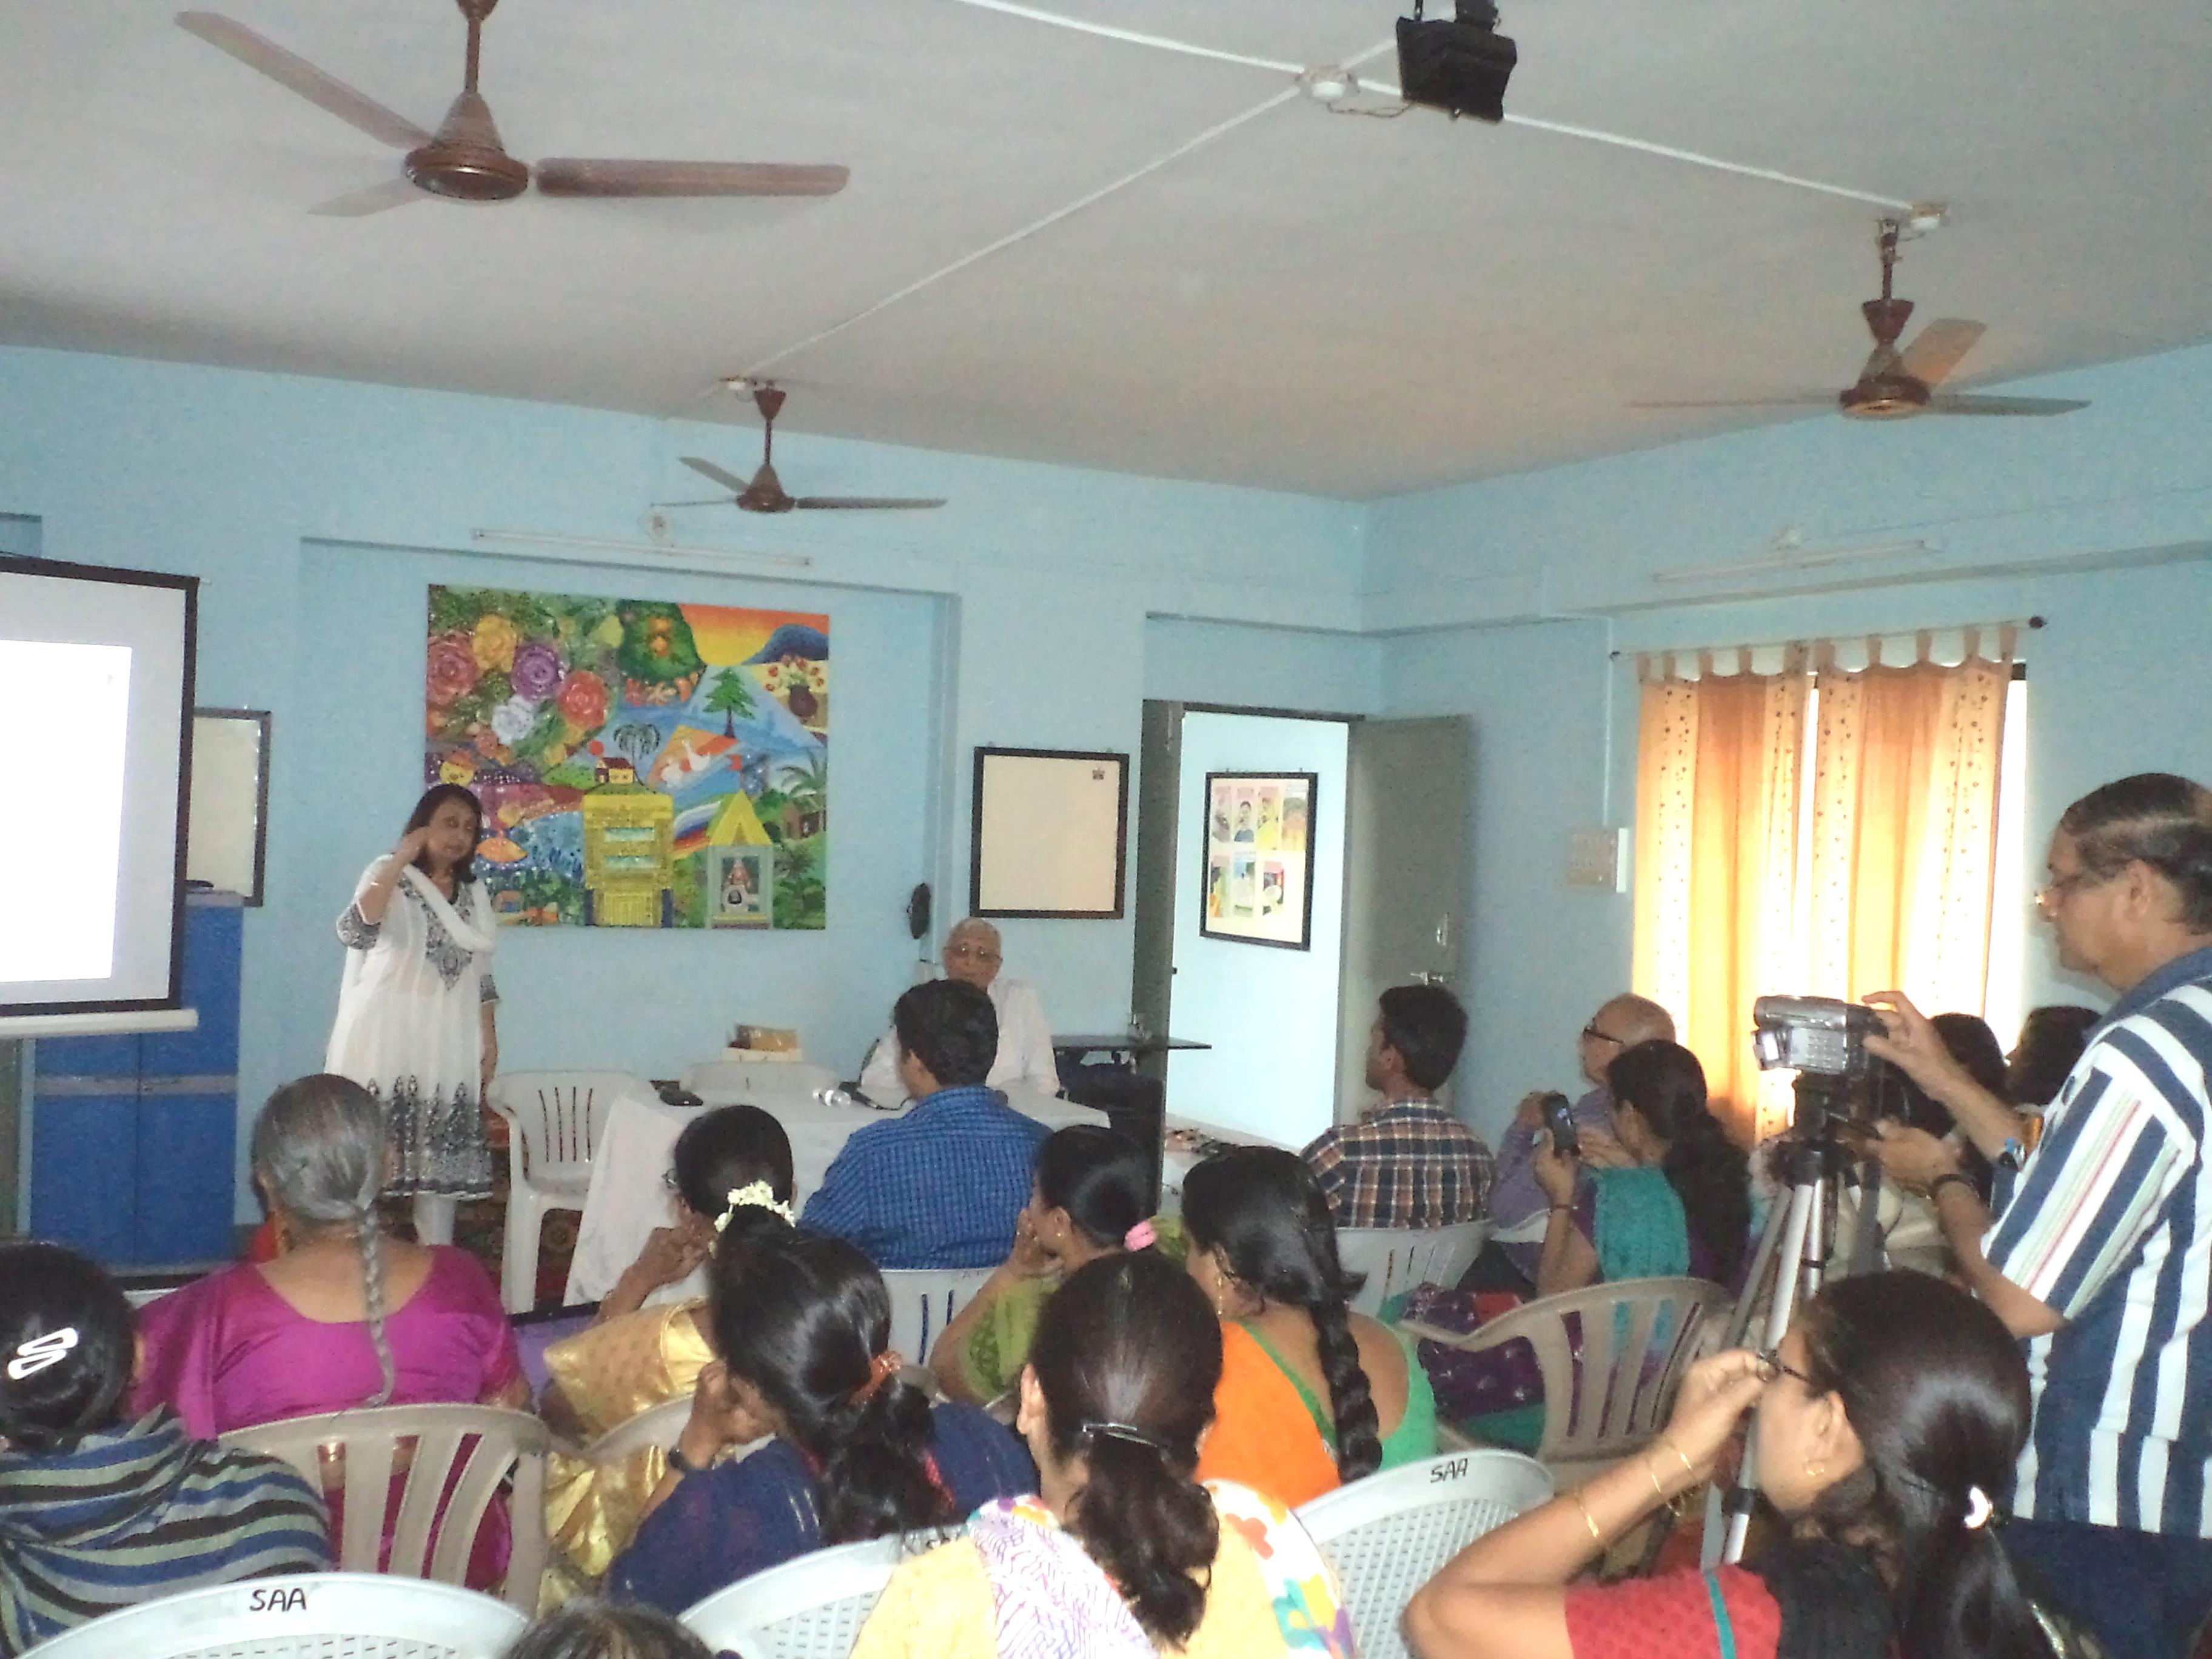 Maina Foundation's visit to SAA (Schizophrenia Awareness Association) in Pune